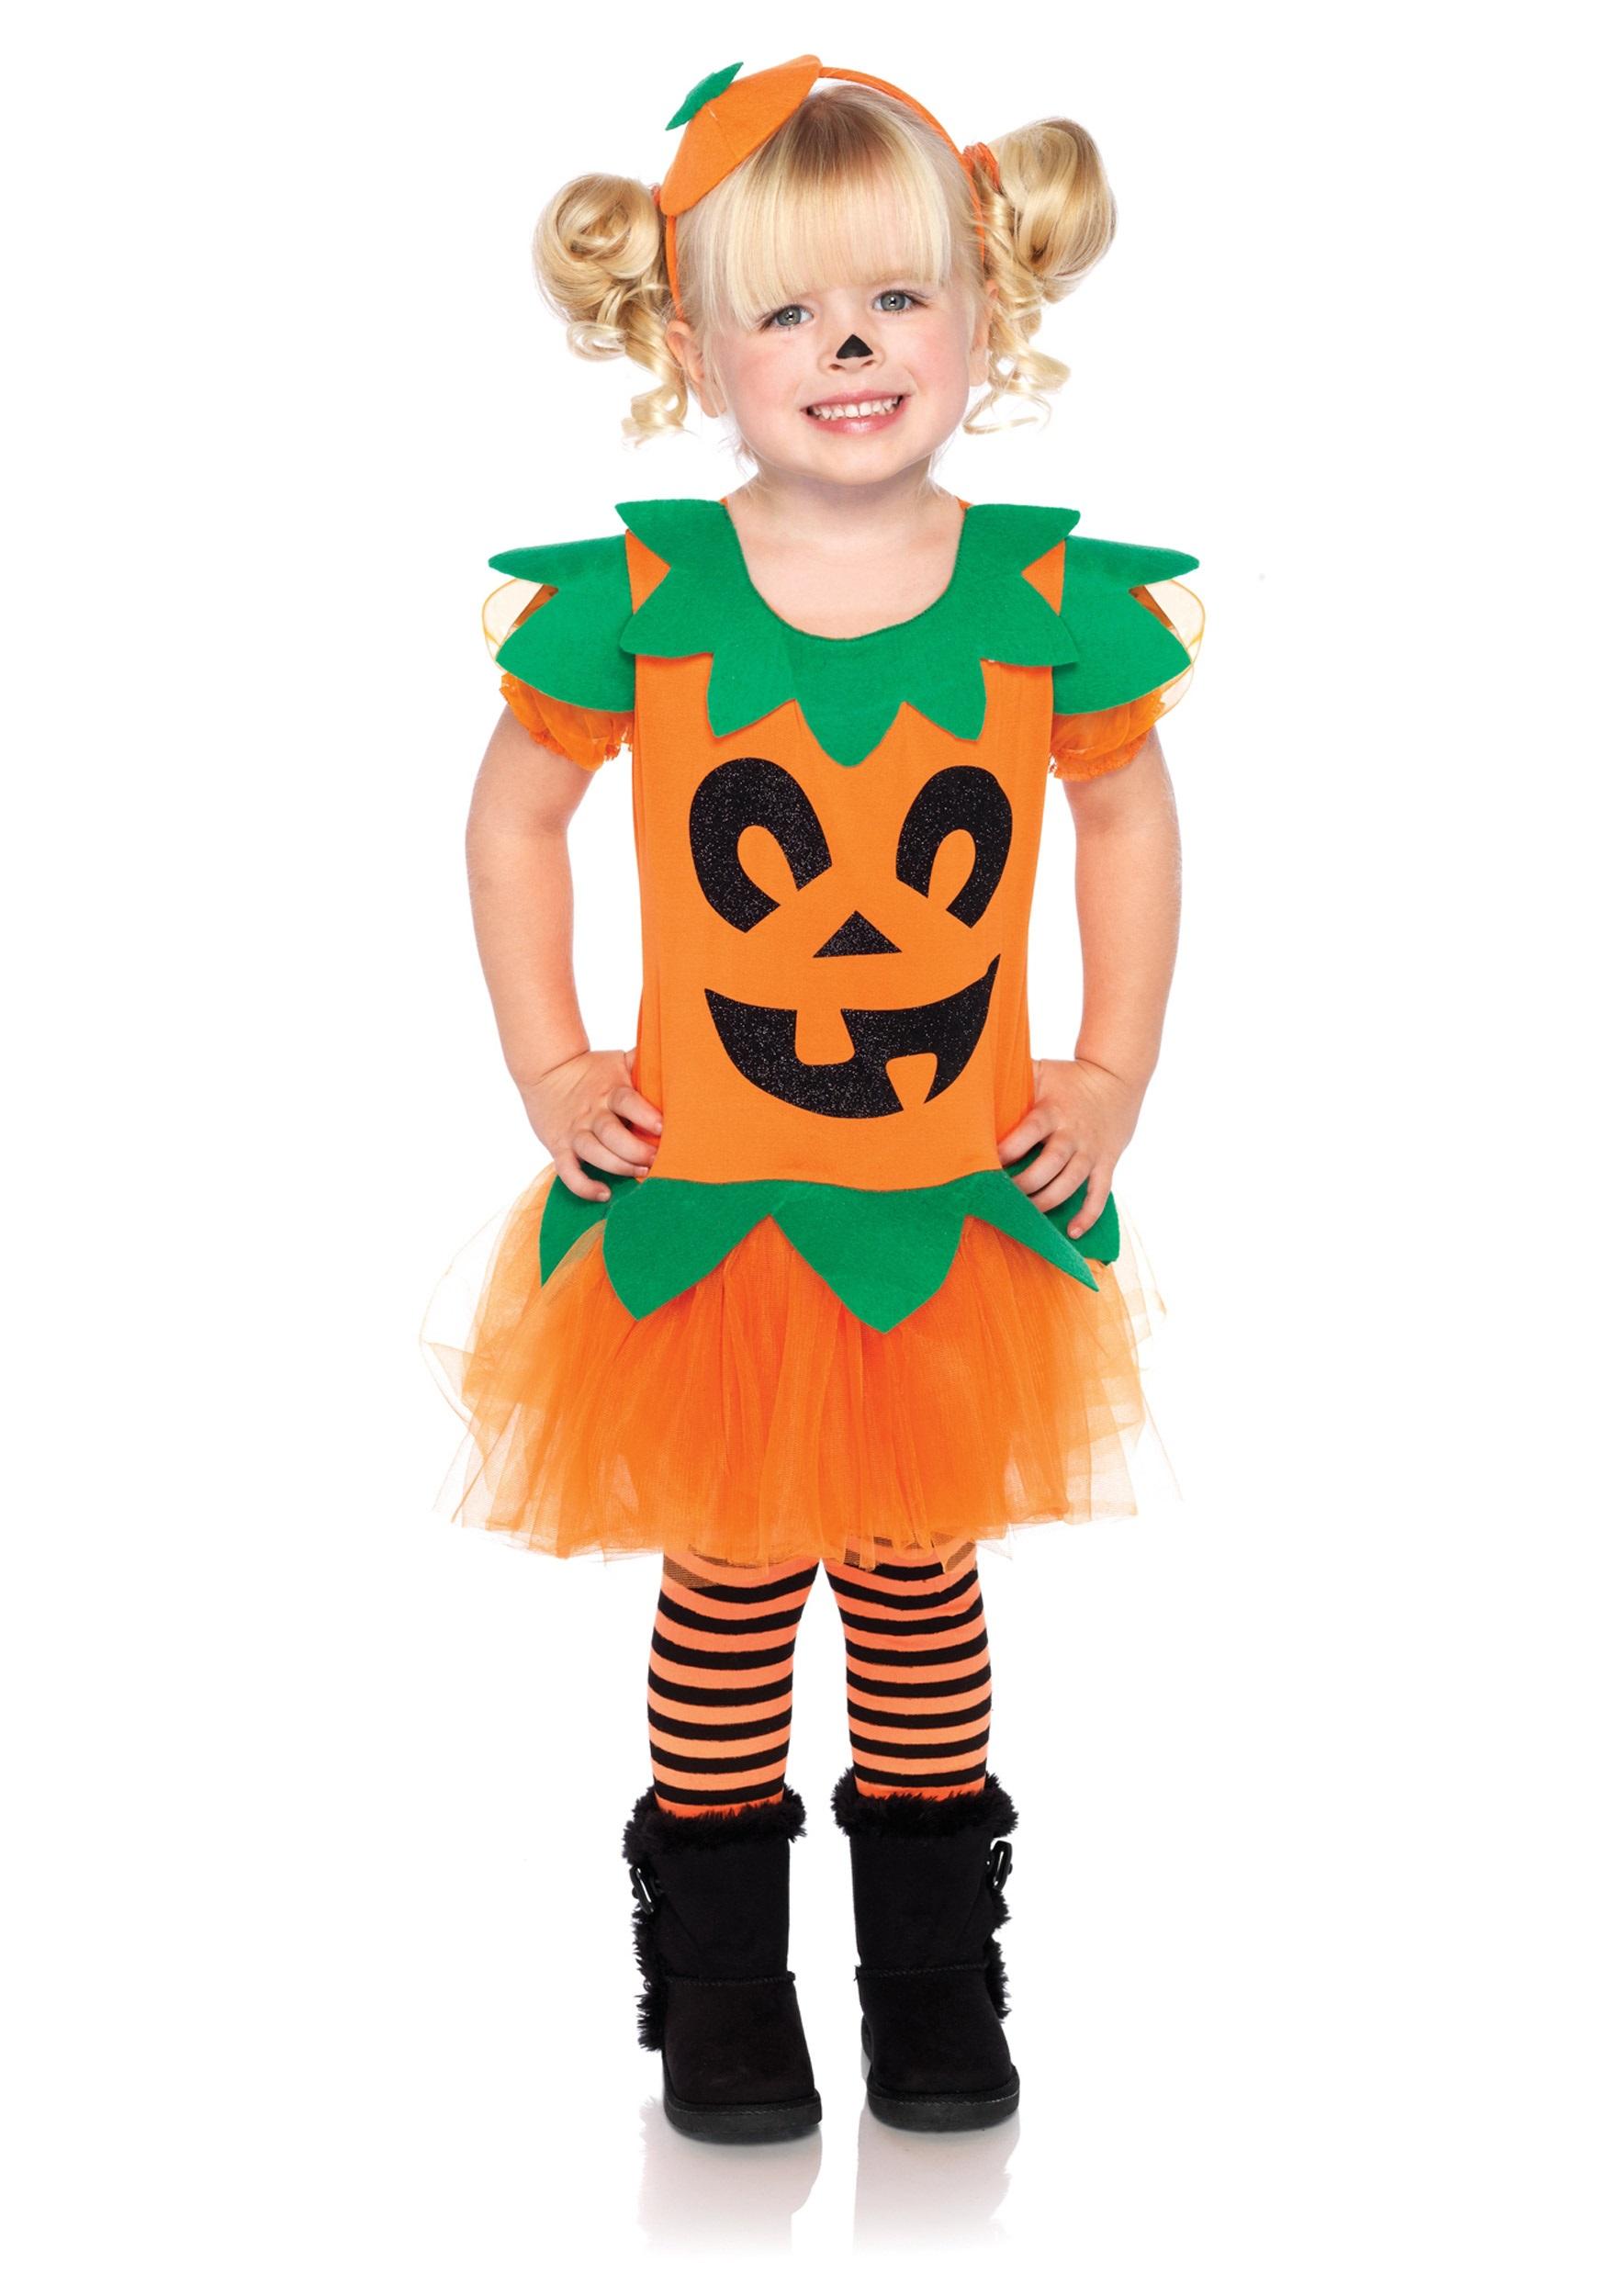 Child Pretty Pumpkin Costume  sc 1 st  Halloween Costumes & Child Pretty Pumpkin Costume - Halloween Costumes